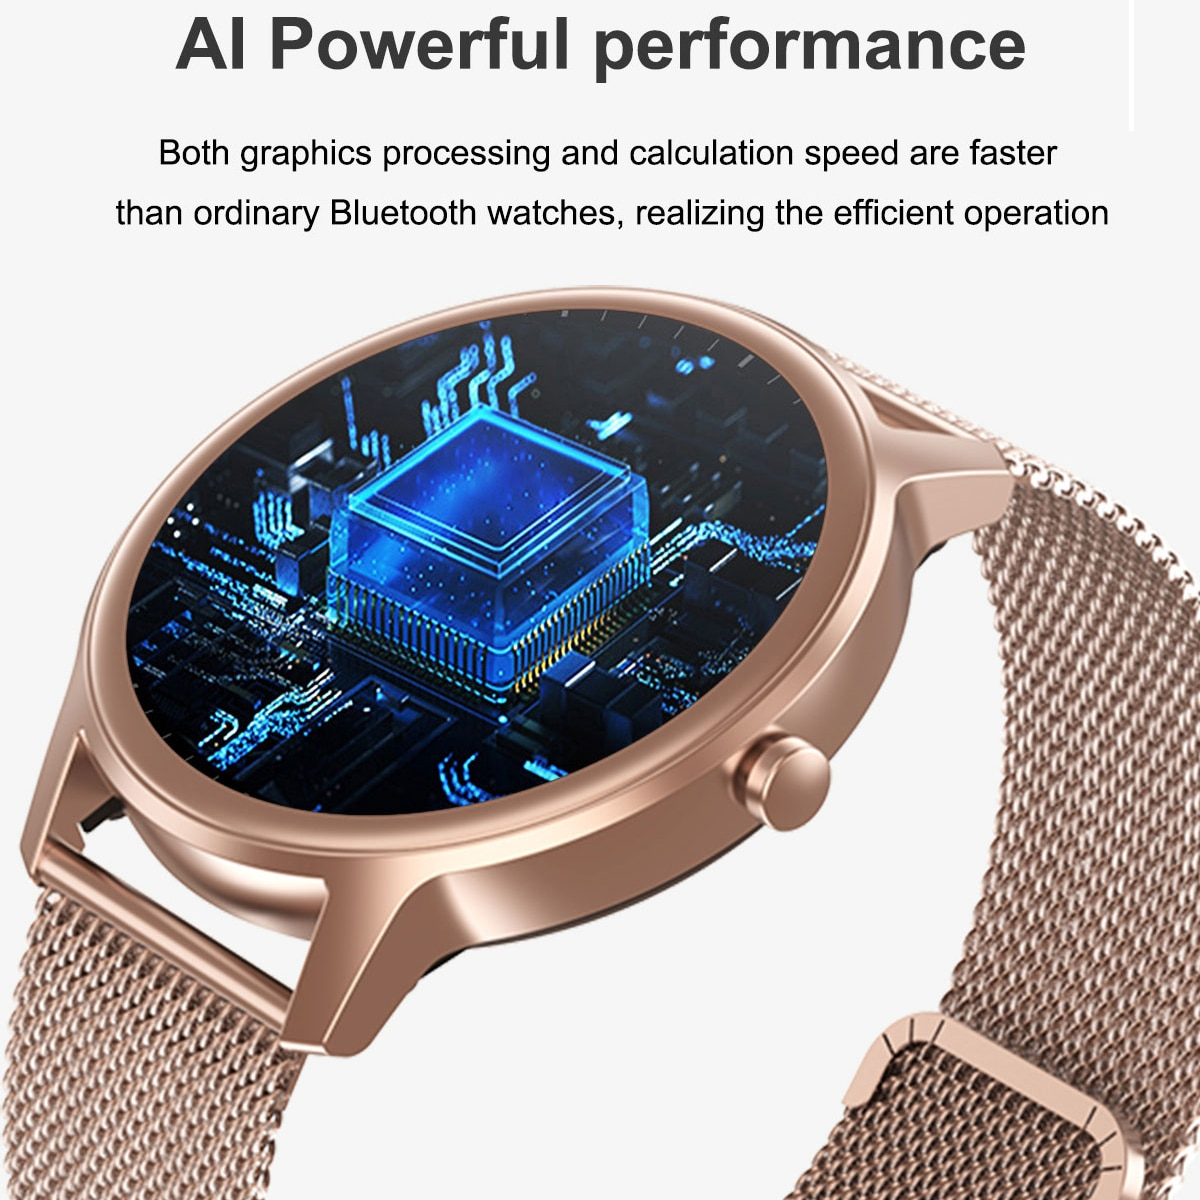 DT56 Smart Watch Women Men's Watches Smartwatch Women's Wristwatch Heart Rate Sleep Monitor Smart Wristband Smart Bracelet Clock